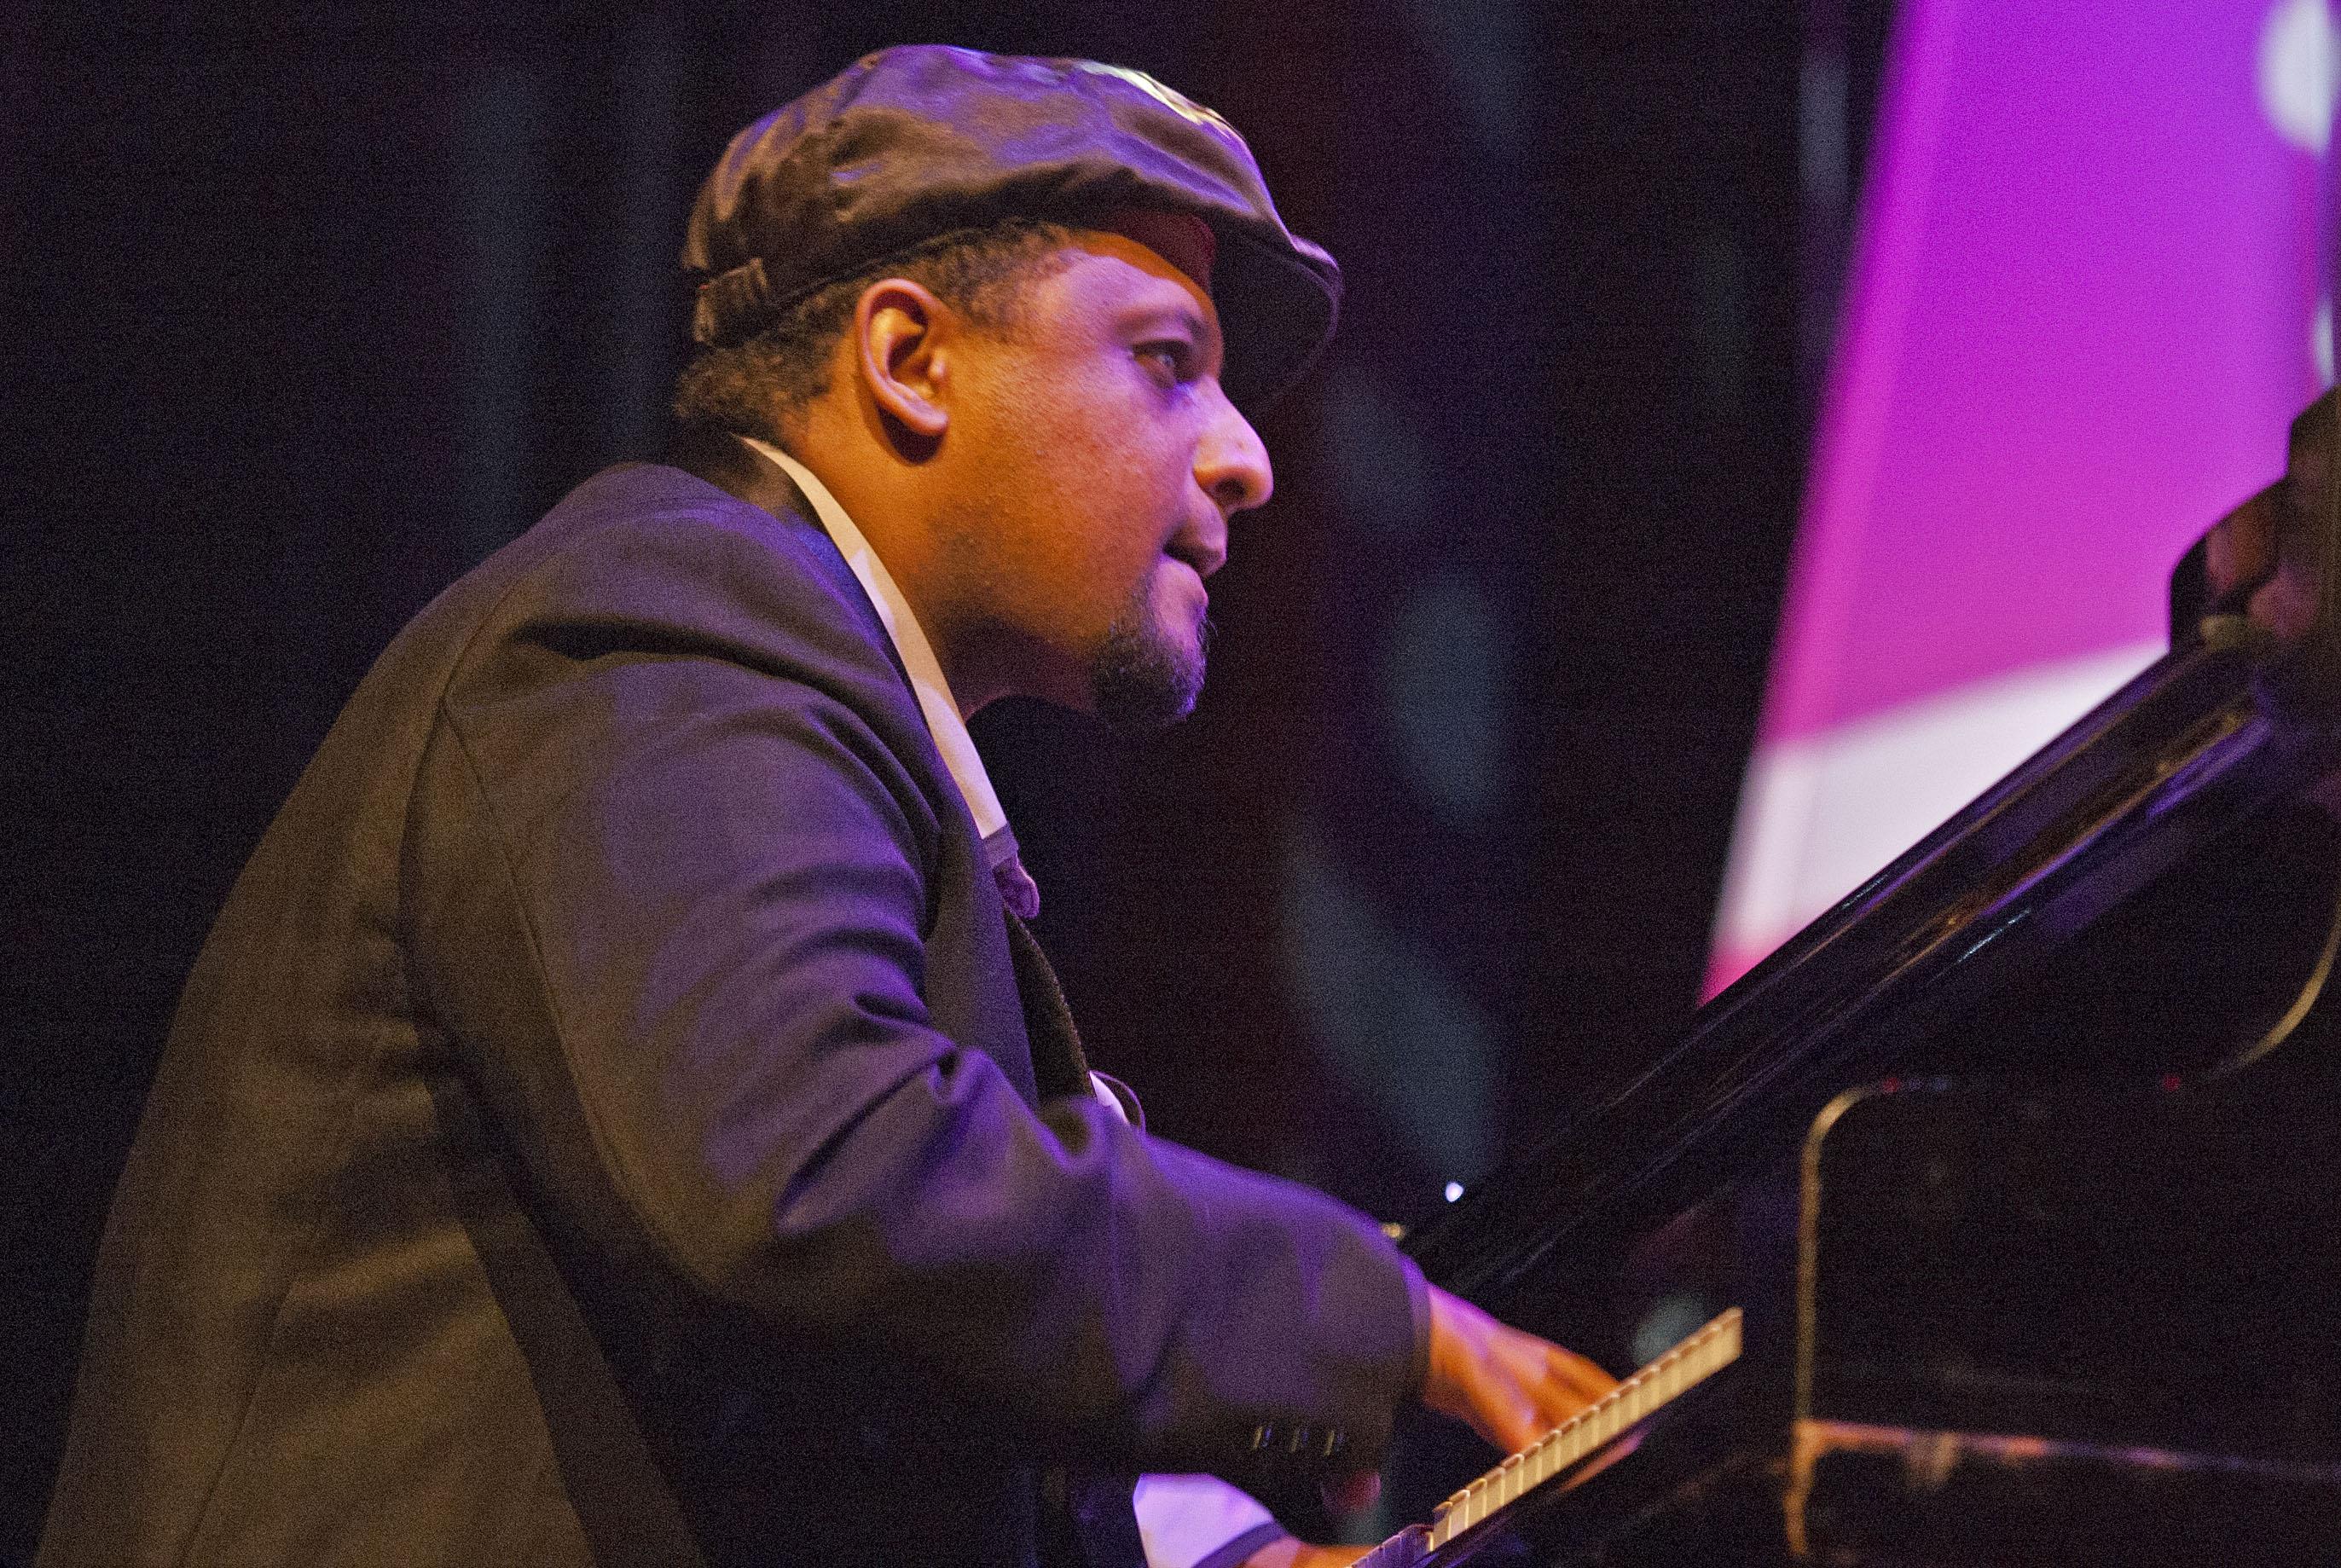 Andre Peterson, Cape Town Jazz Festival 2012